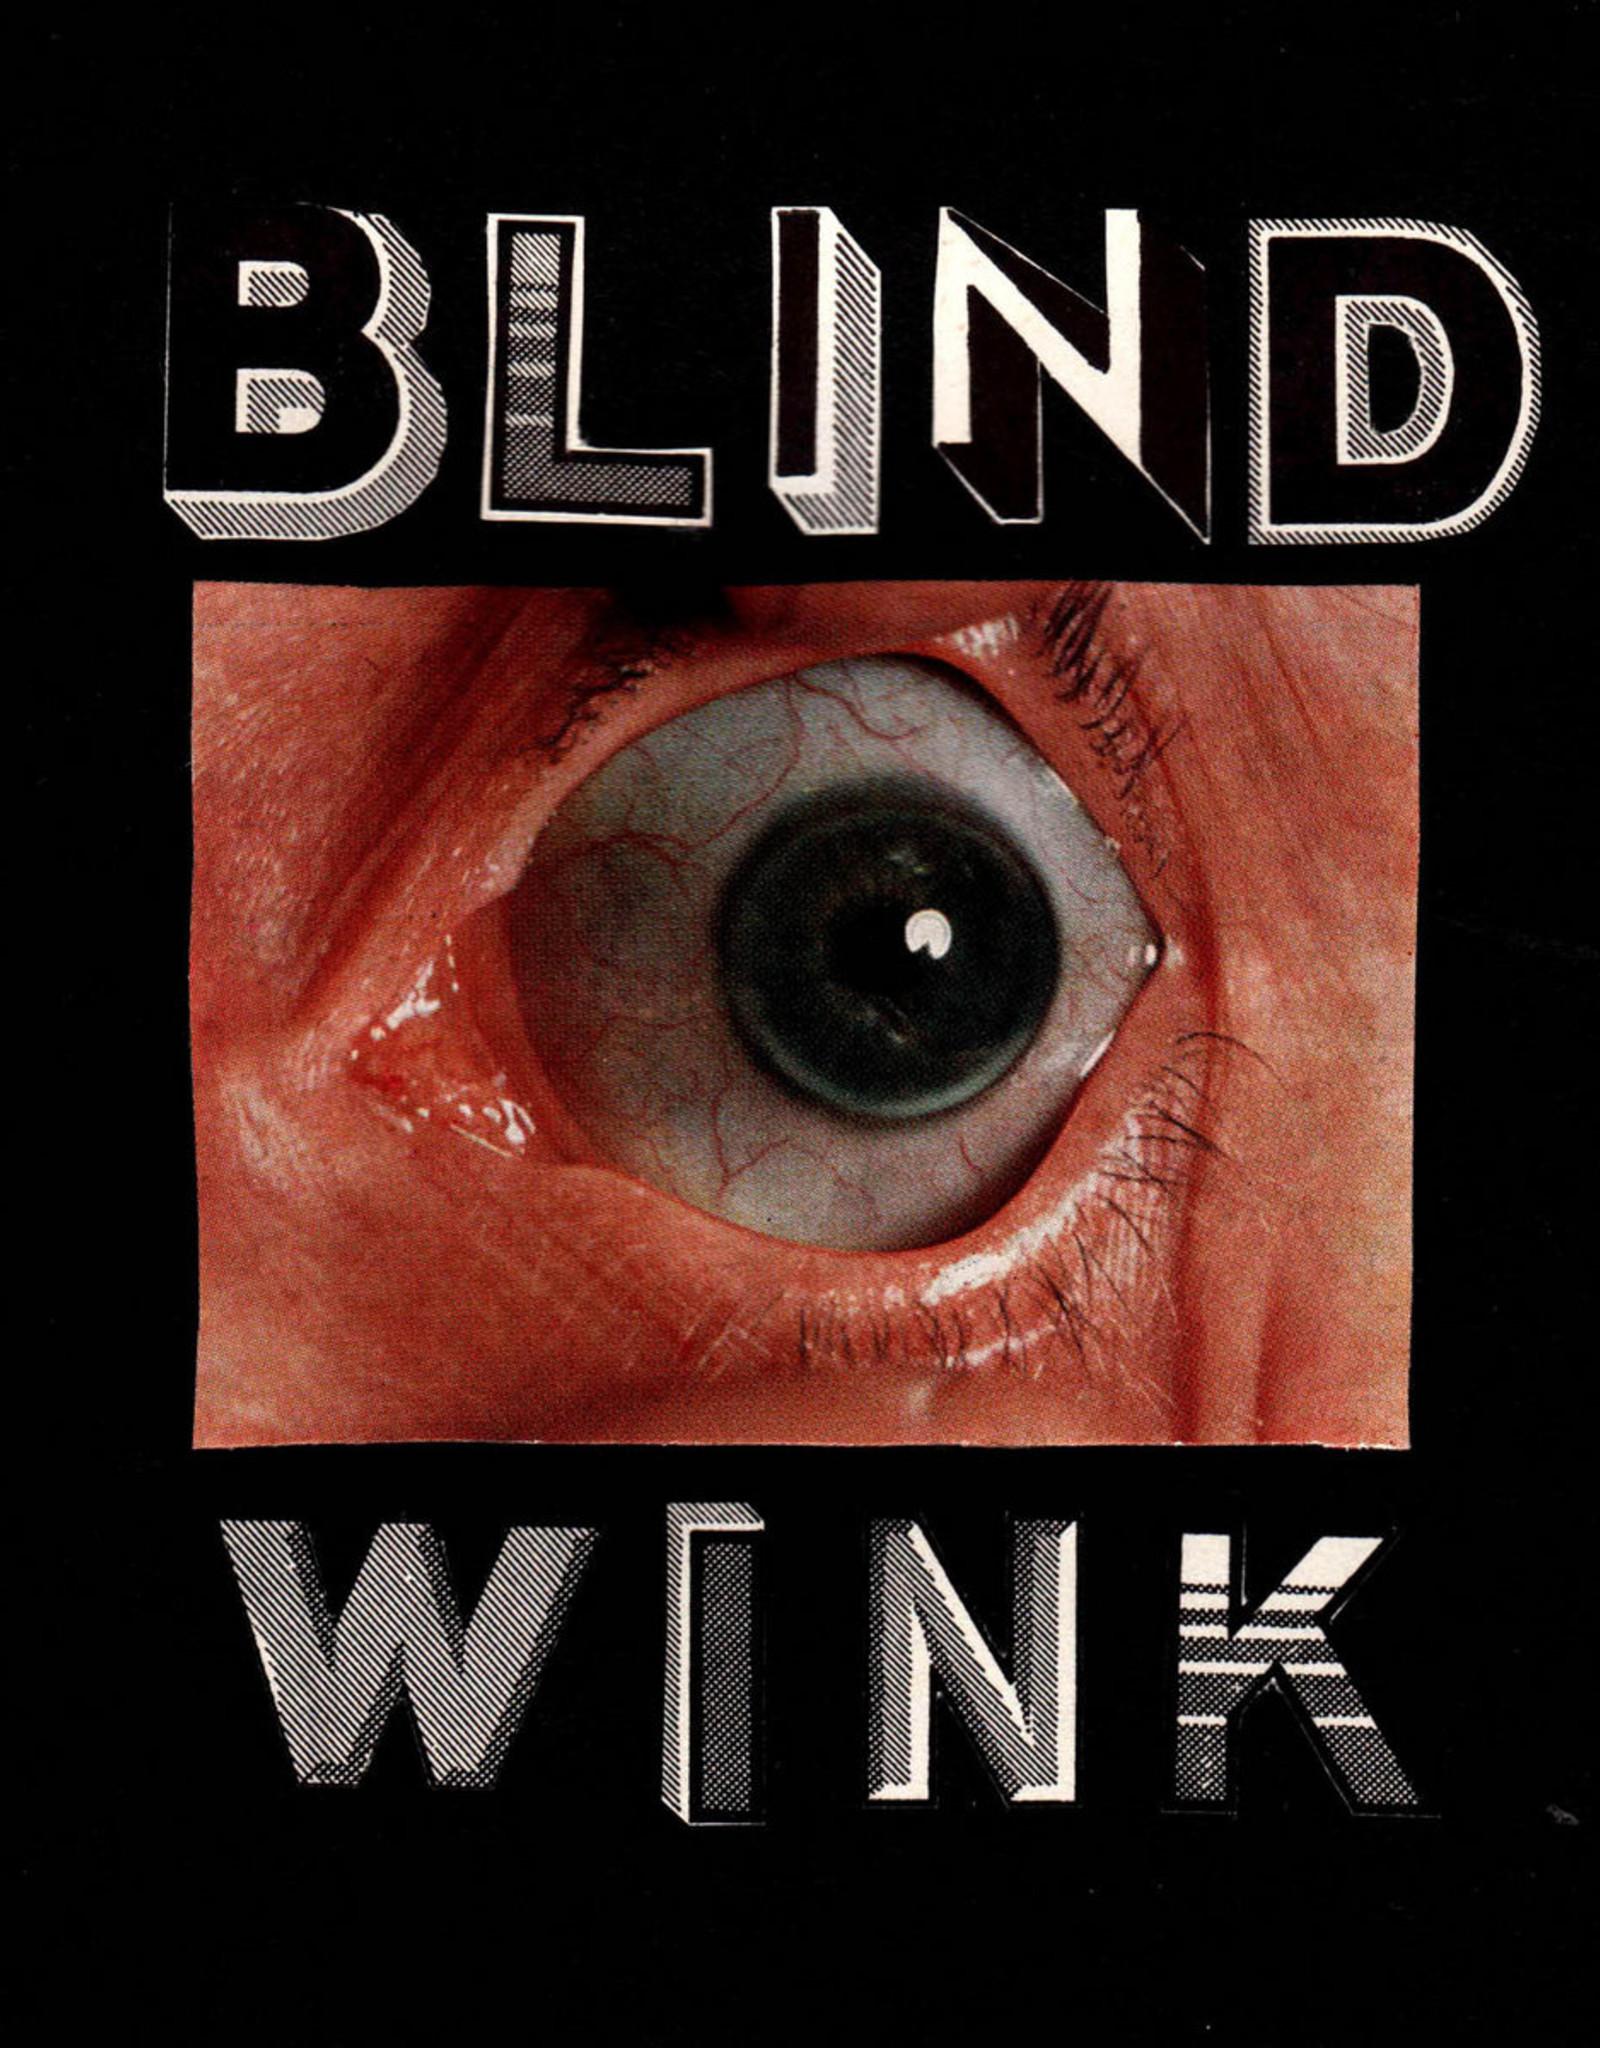 Tenement - Blind Wink